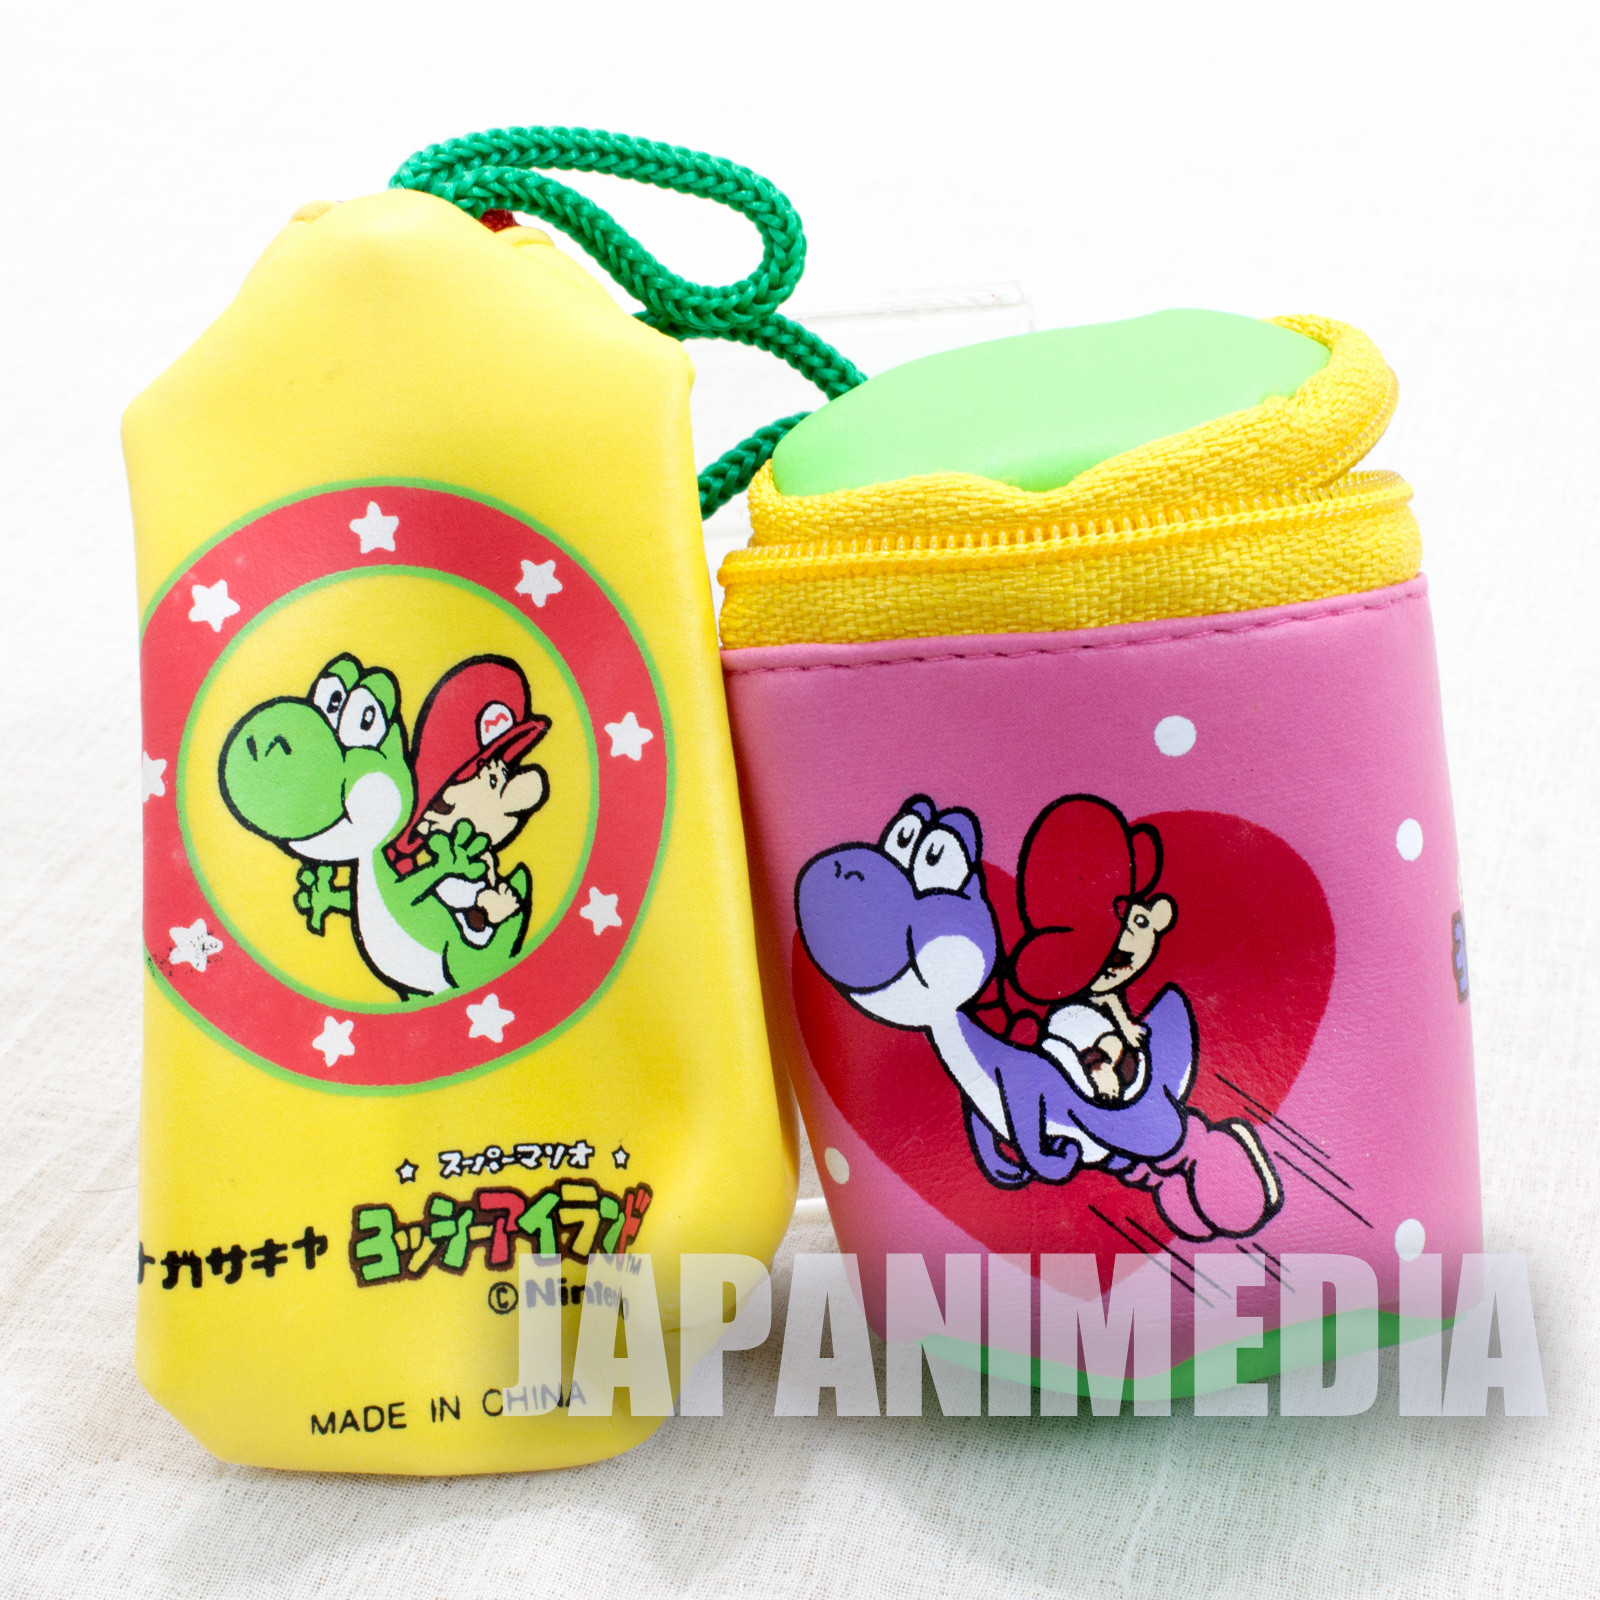 Retro Super Mario Bros. Yoshi's Island Small size Bag Case 2pc Set SNES NINTENDO